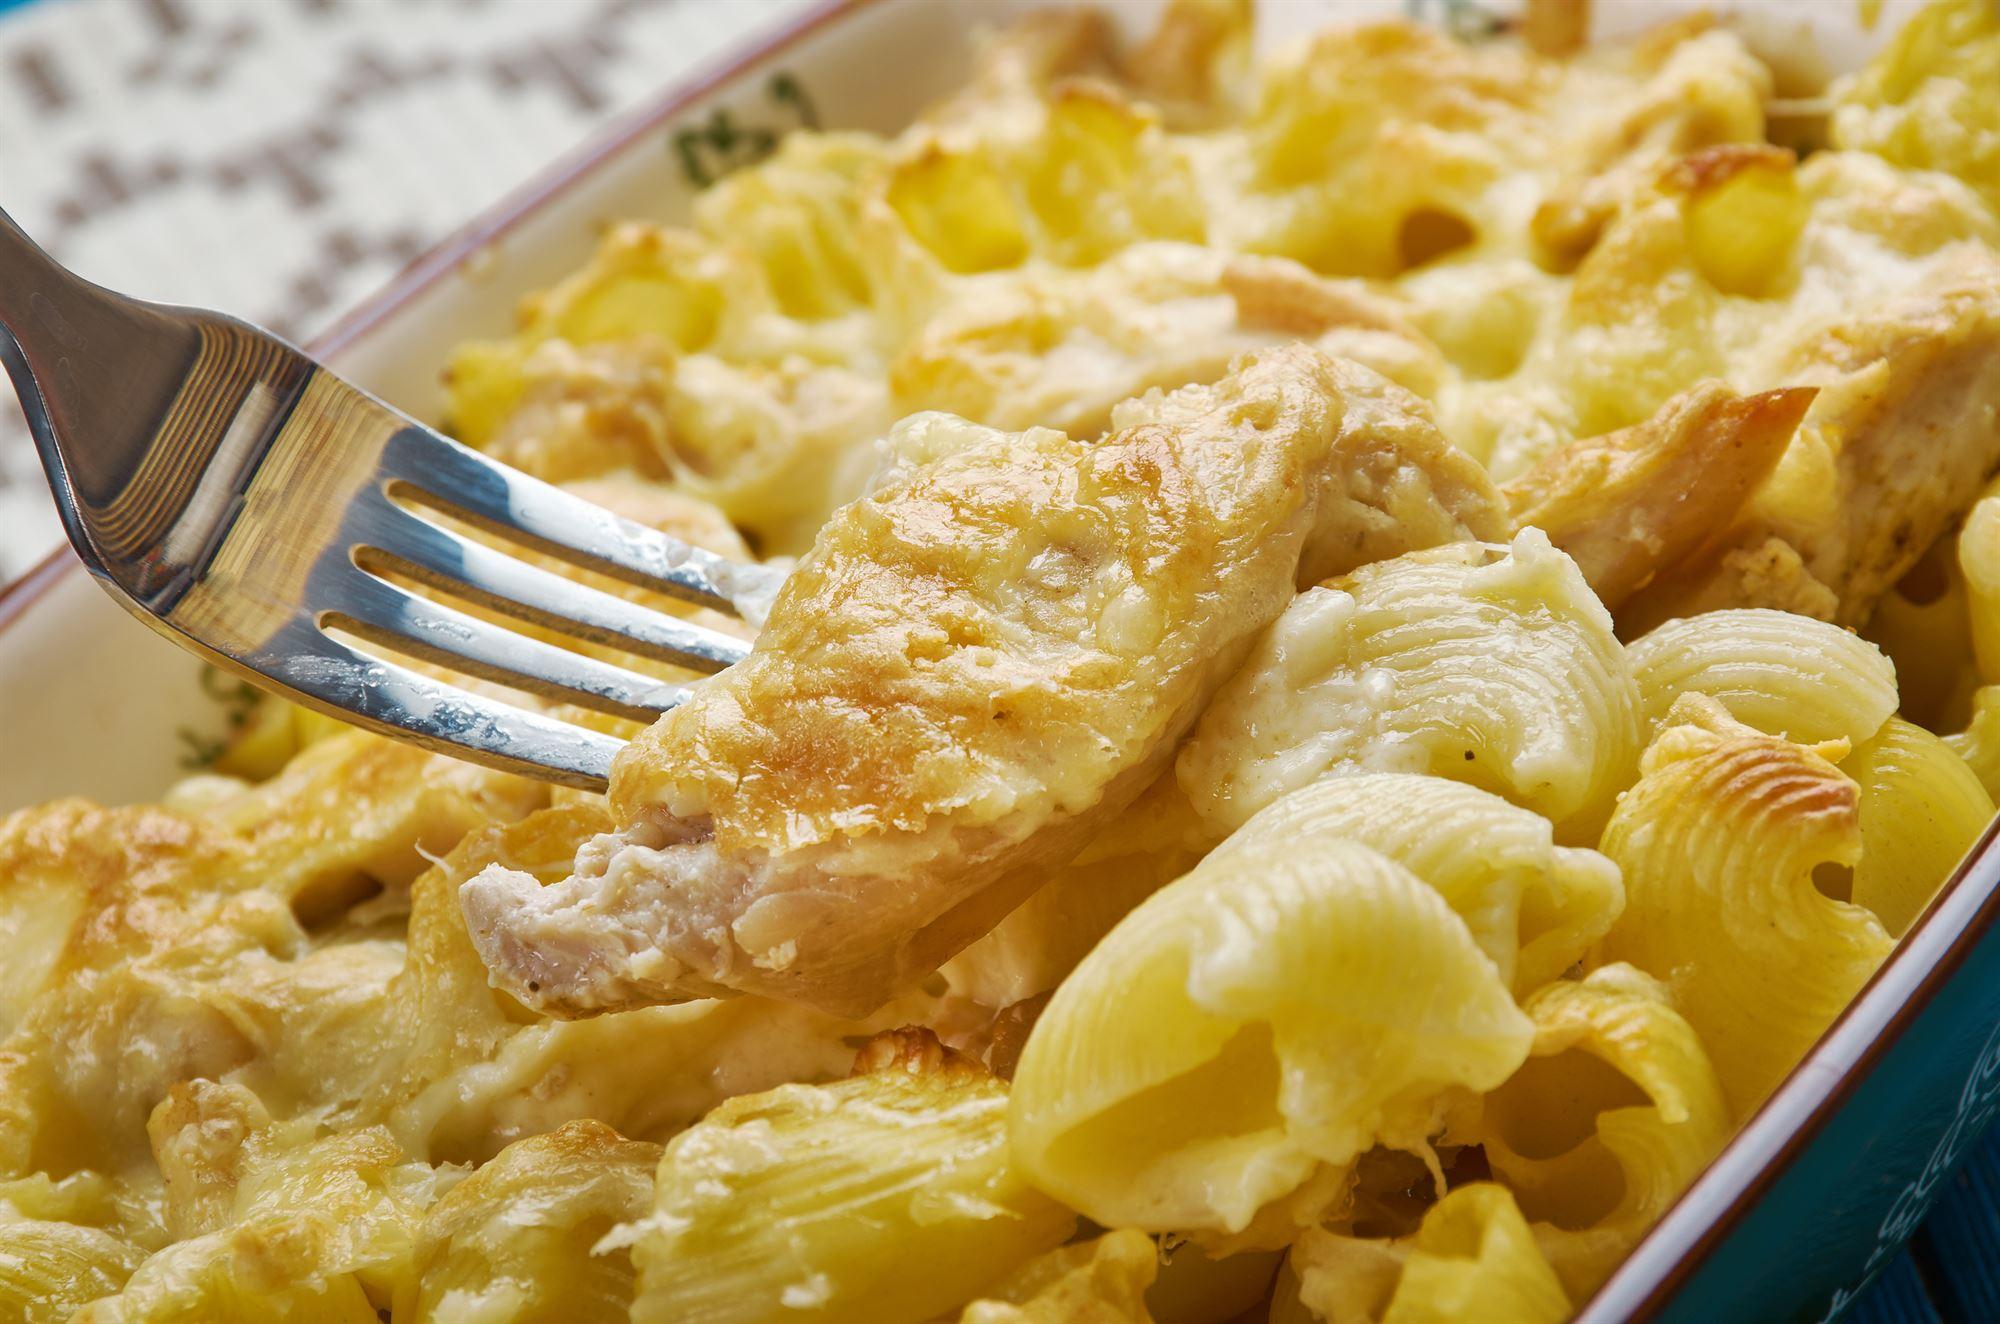 Kyllingebryst på gratineret pasta